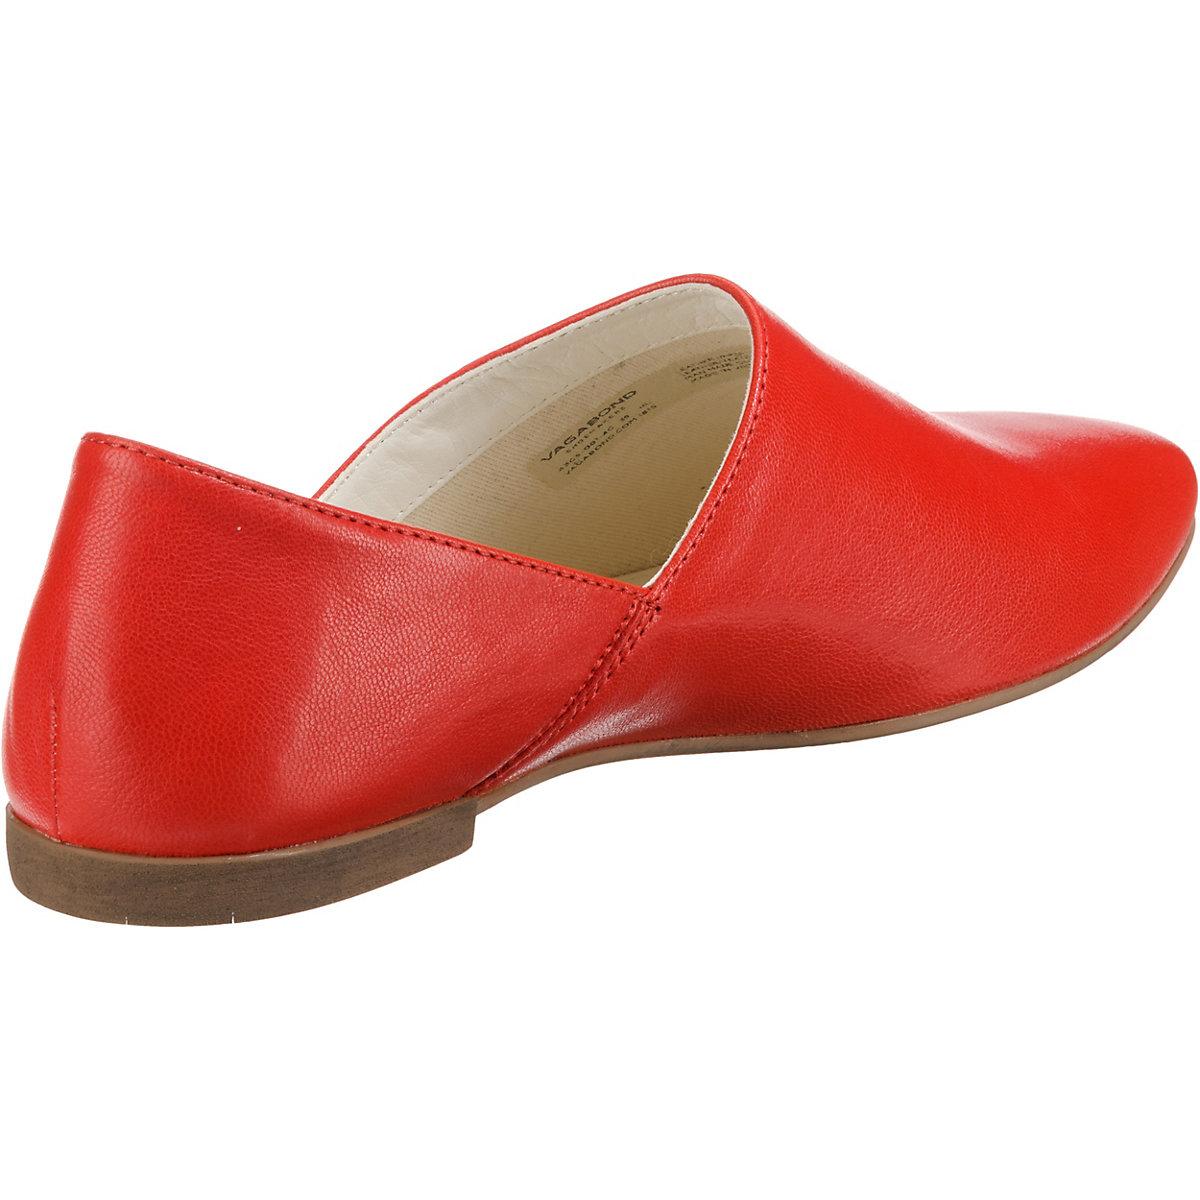 Vagabond, Ayden Klassische Slipper, Rot